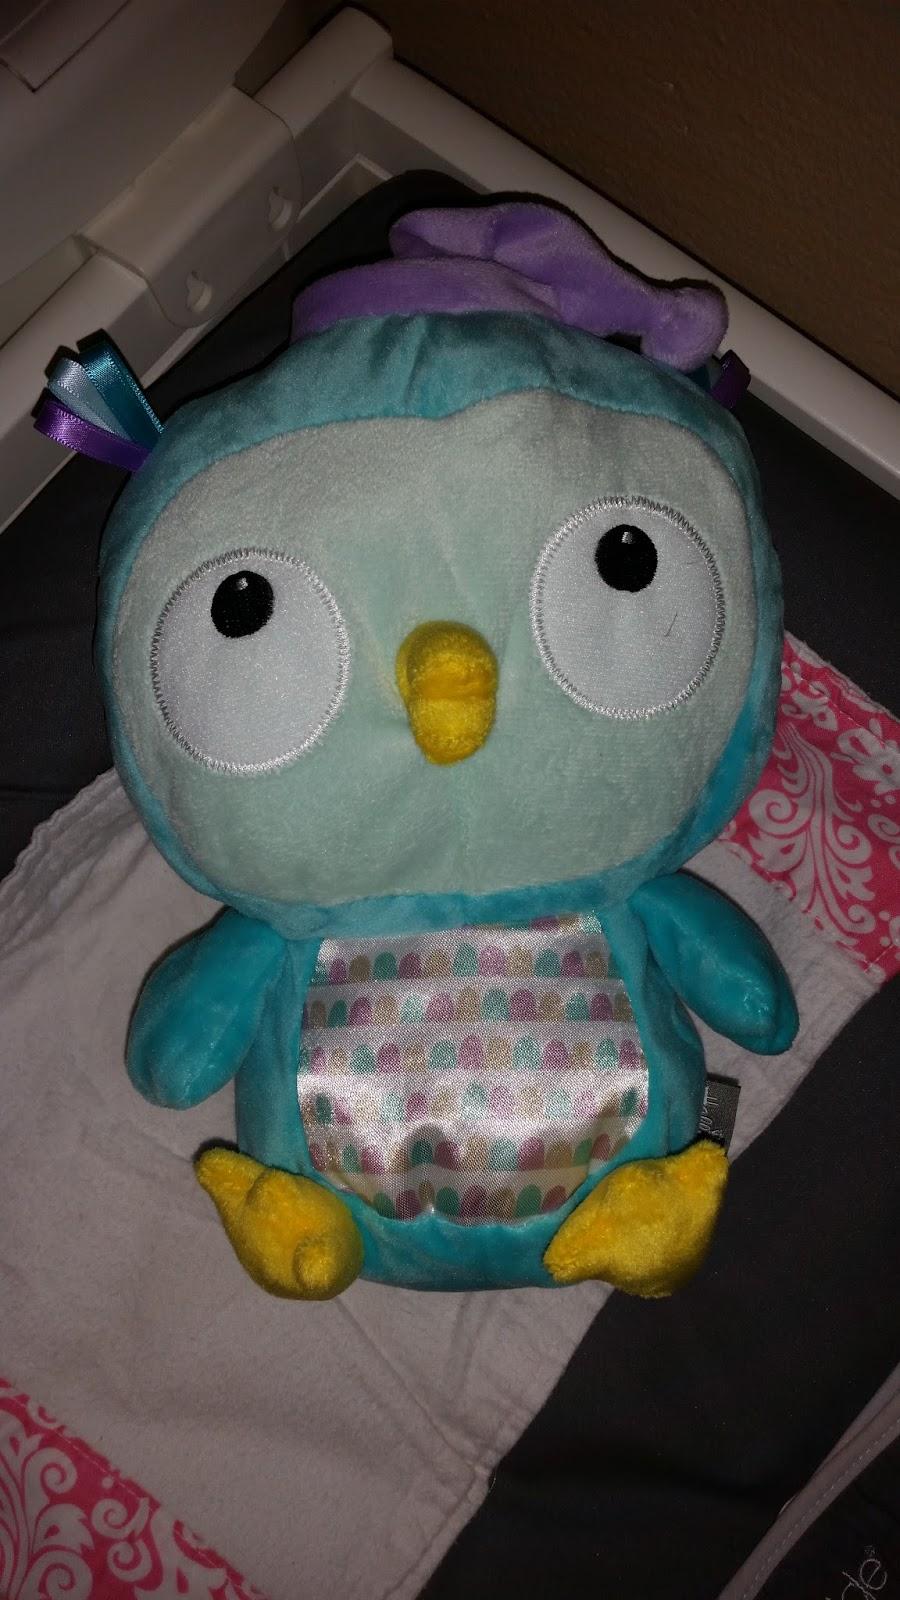 Hallmark Good Night Kisses Baby Gift Set Review